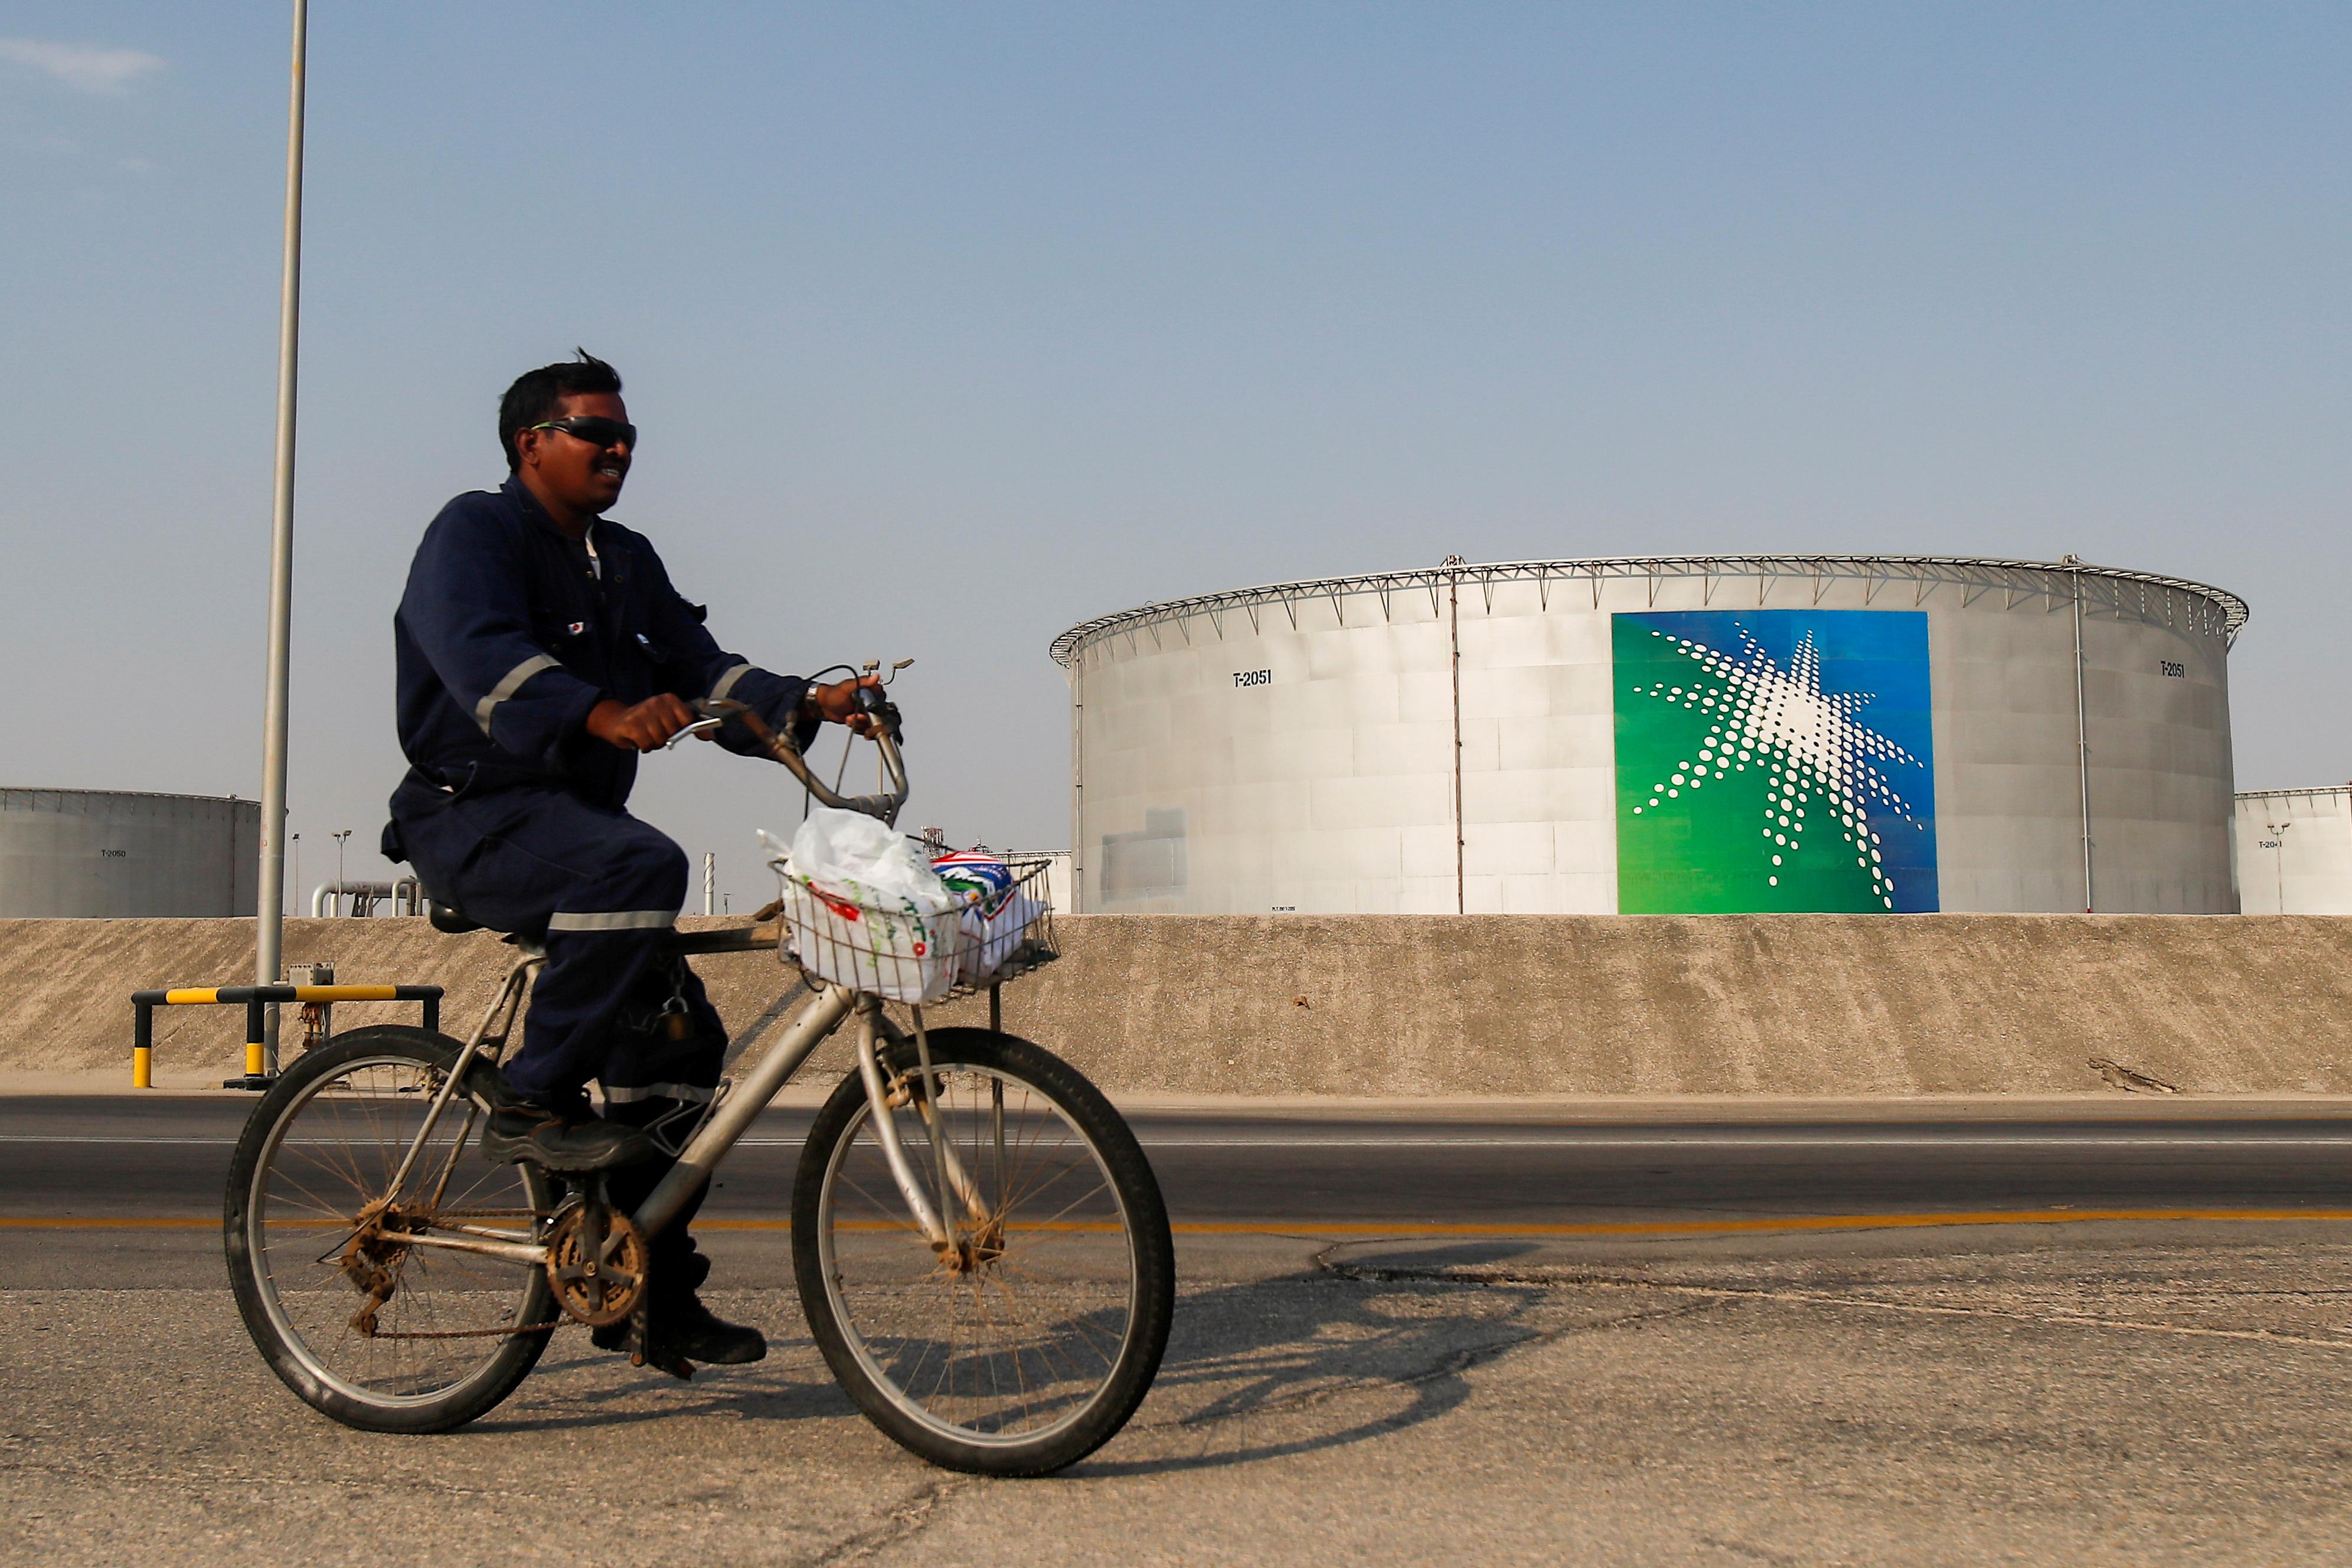 An employee rides a bicycle next to oil tanks at Saudi Aramco oil facility in Abqaiq, Saudi Arabia October 12, 2019. REUTERS/Maxim Shemetov